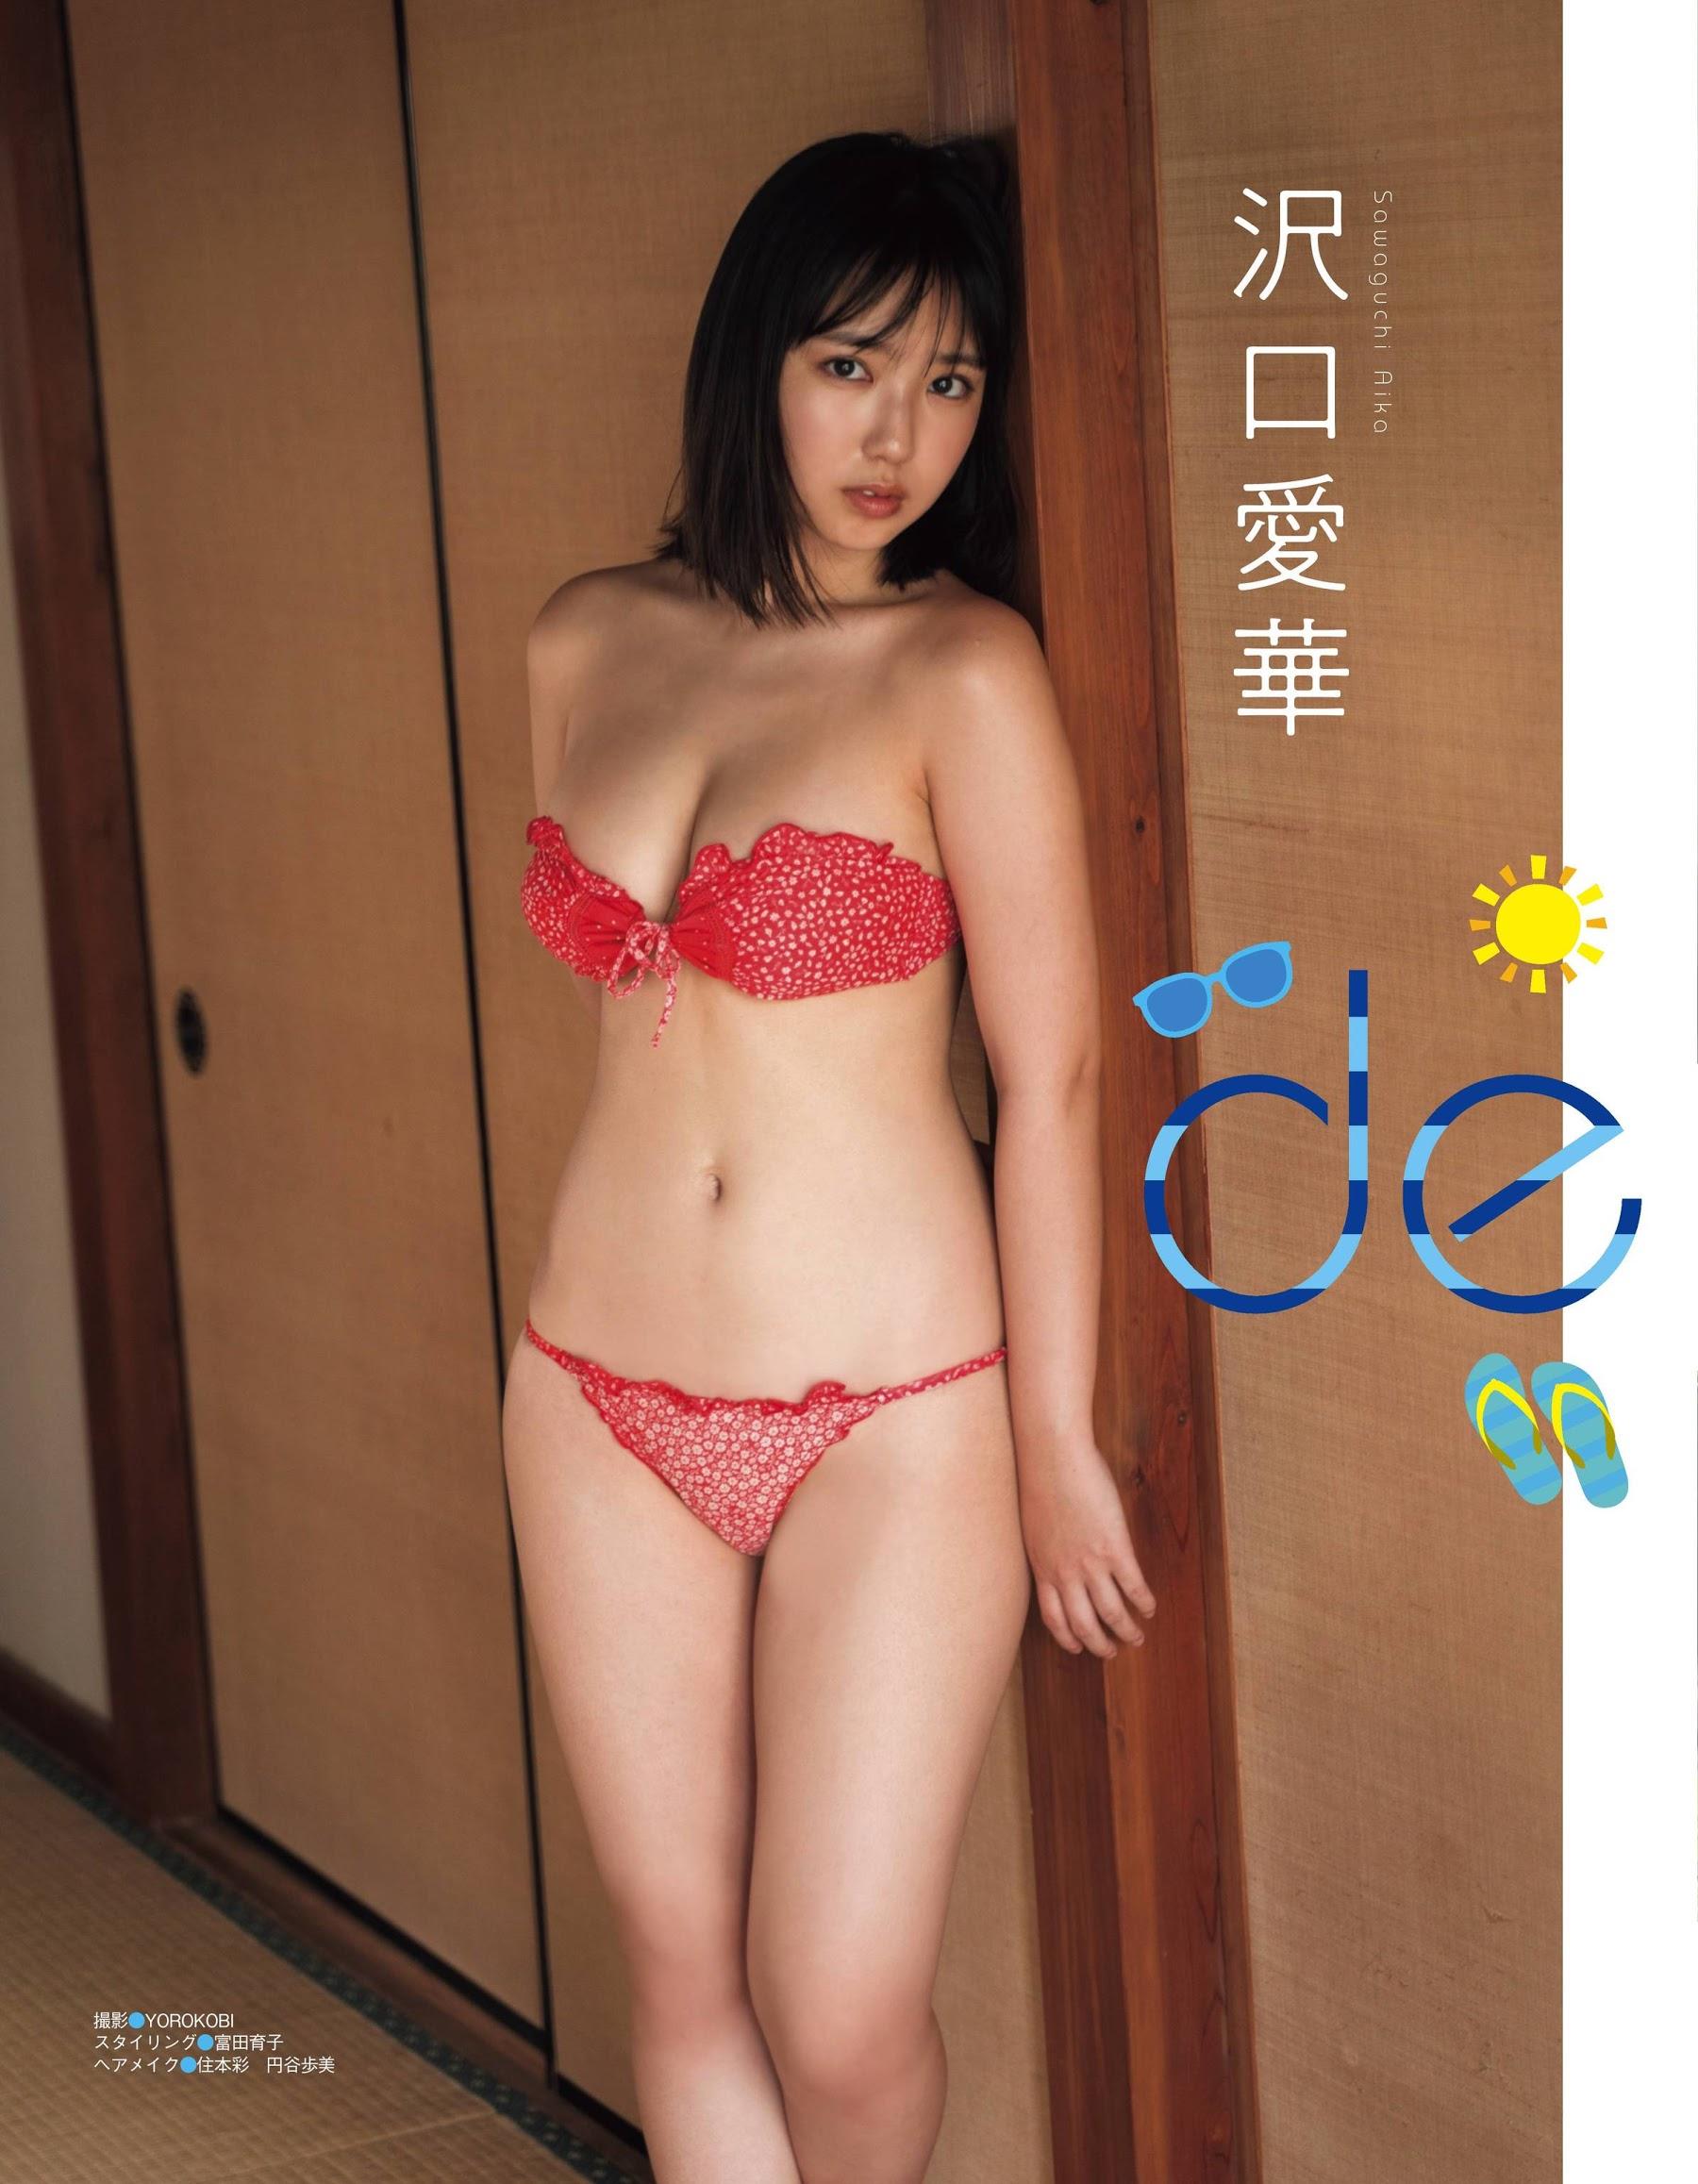 Reiwa gravure strongest JK Sawaguchi Aika 2020003